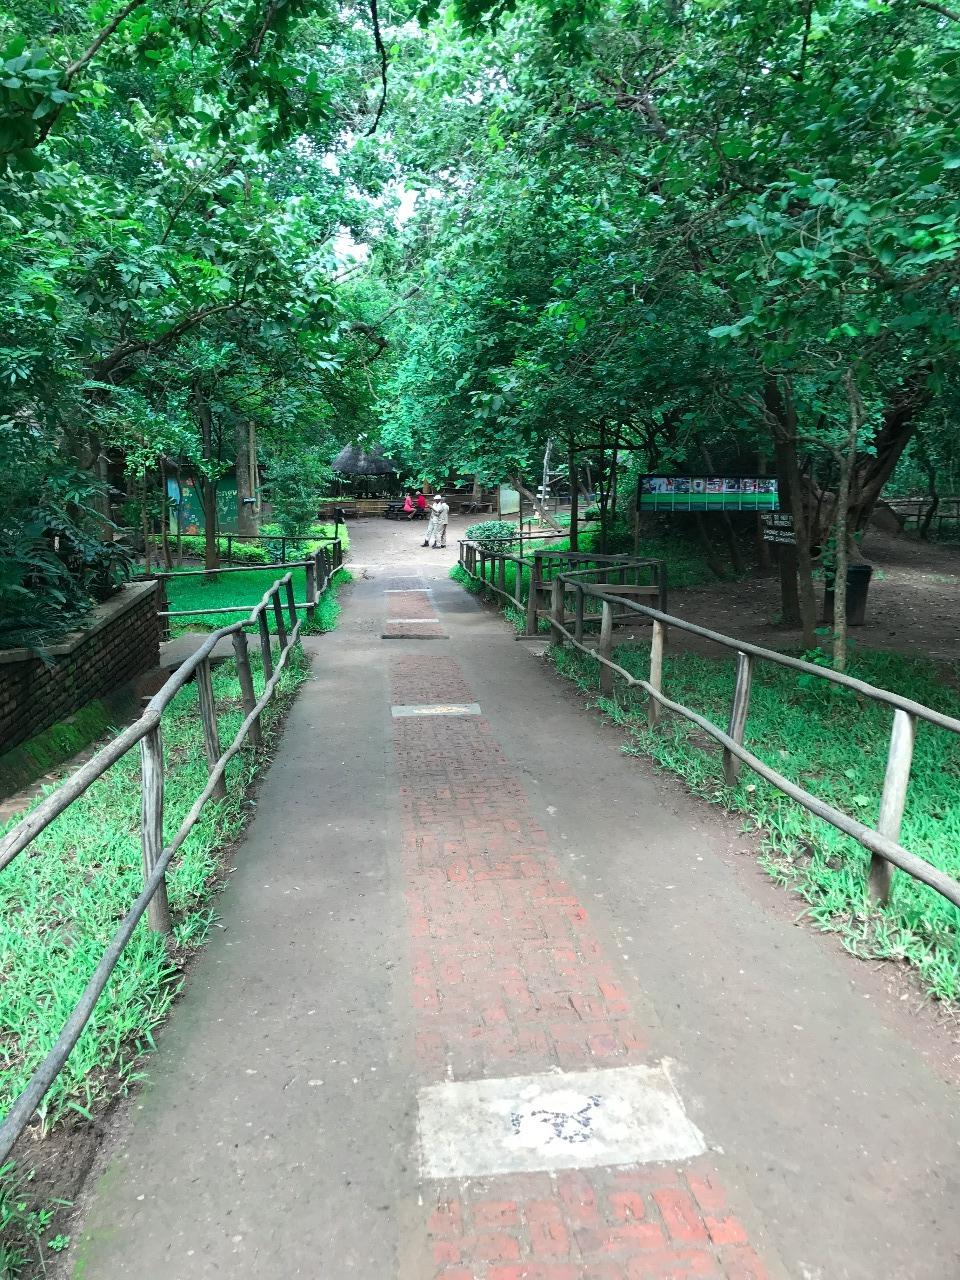 Entering the Lilongwe Wildlife Centre